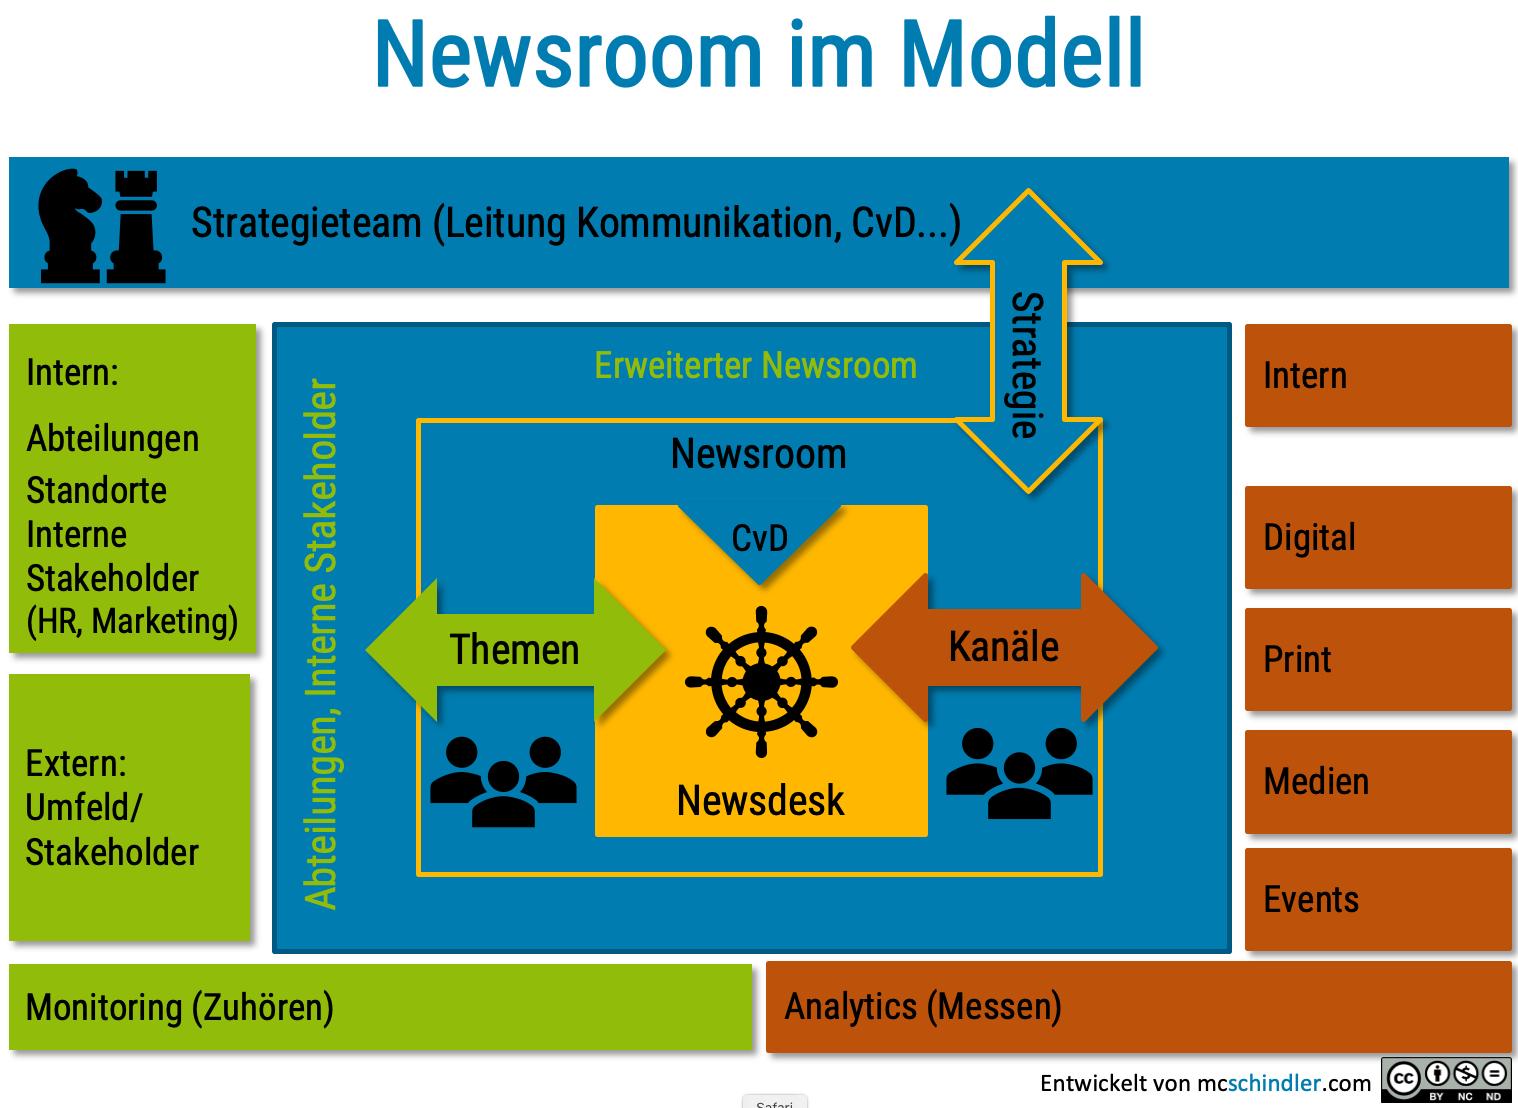 Newsroom Modell